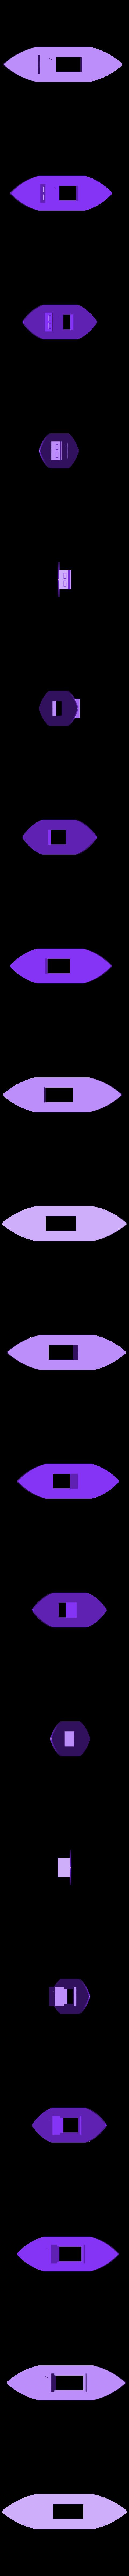 5_Buck_Boat_Deck_002.STL Download free STL file 5 BUCK BOAT! • 3D printing object, Tarnliare